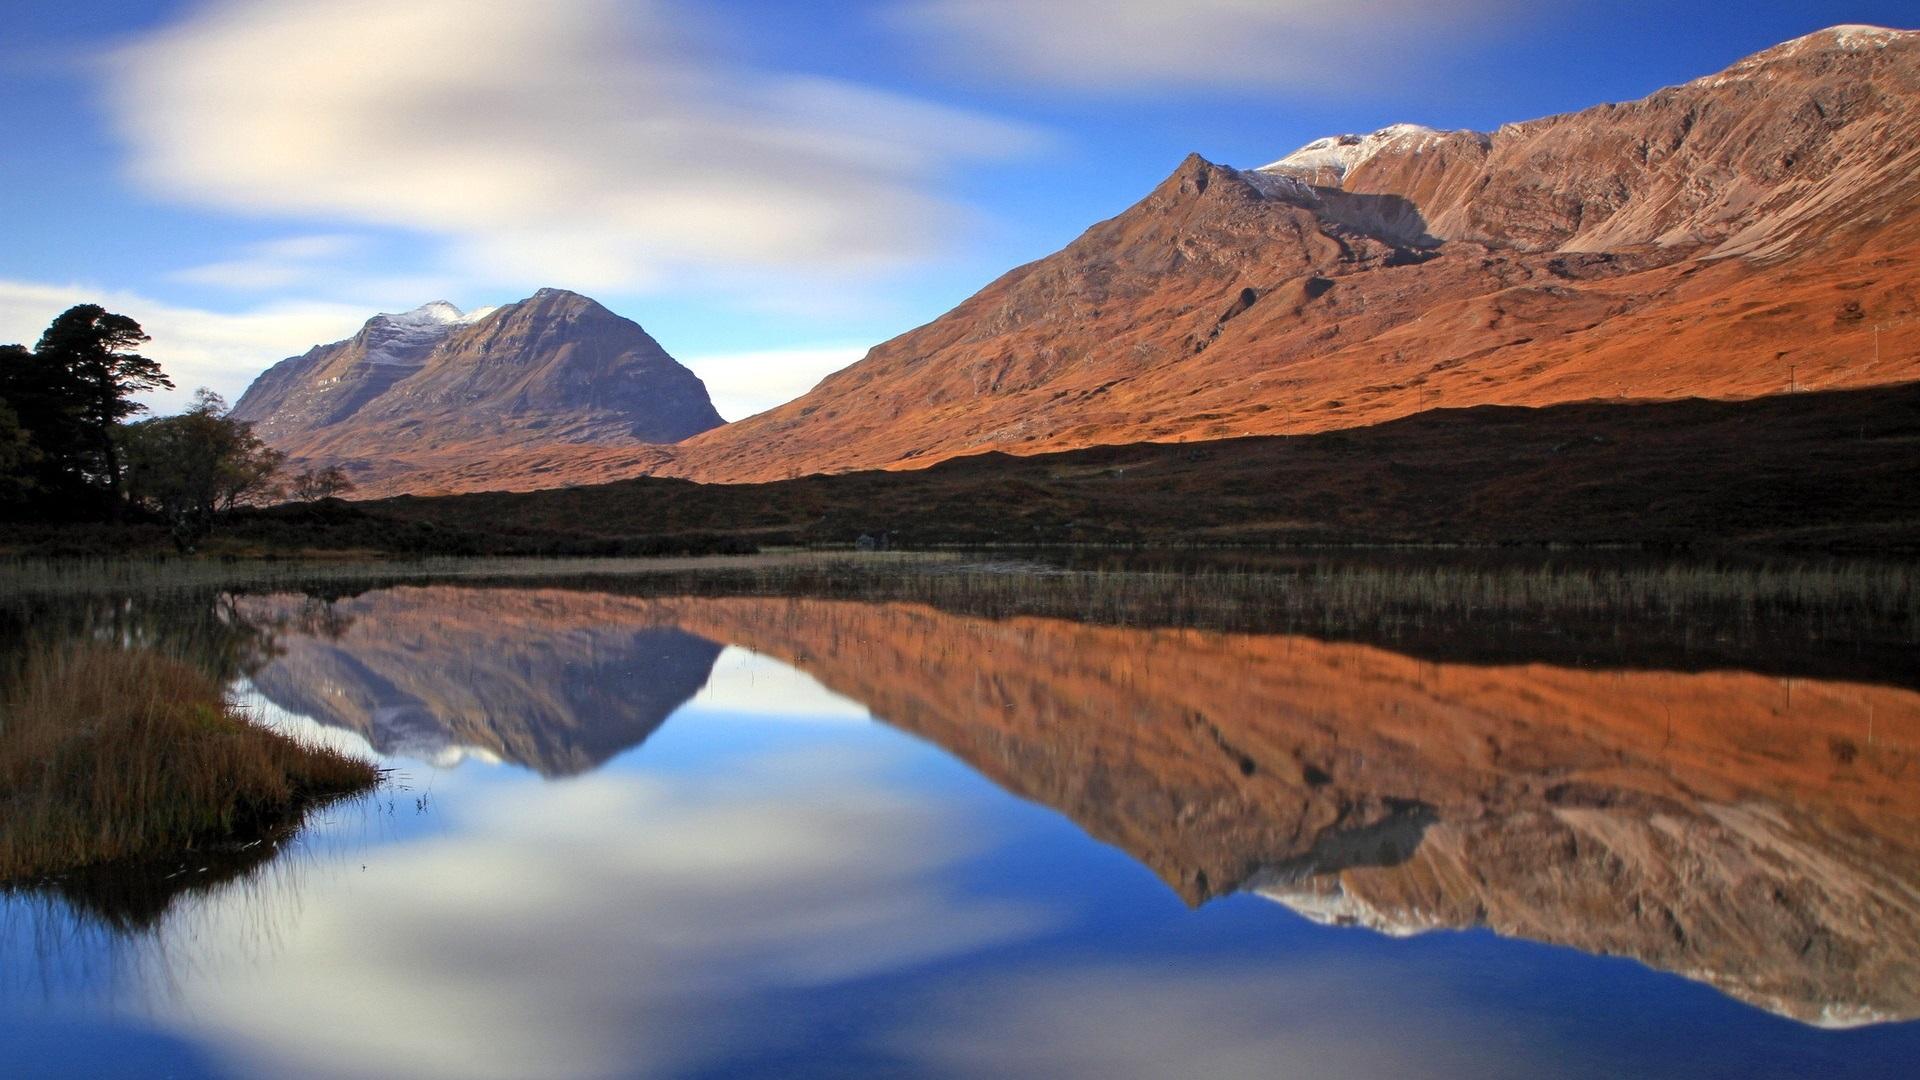 mountains sky lake reflection - photo #29